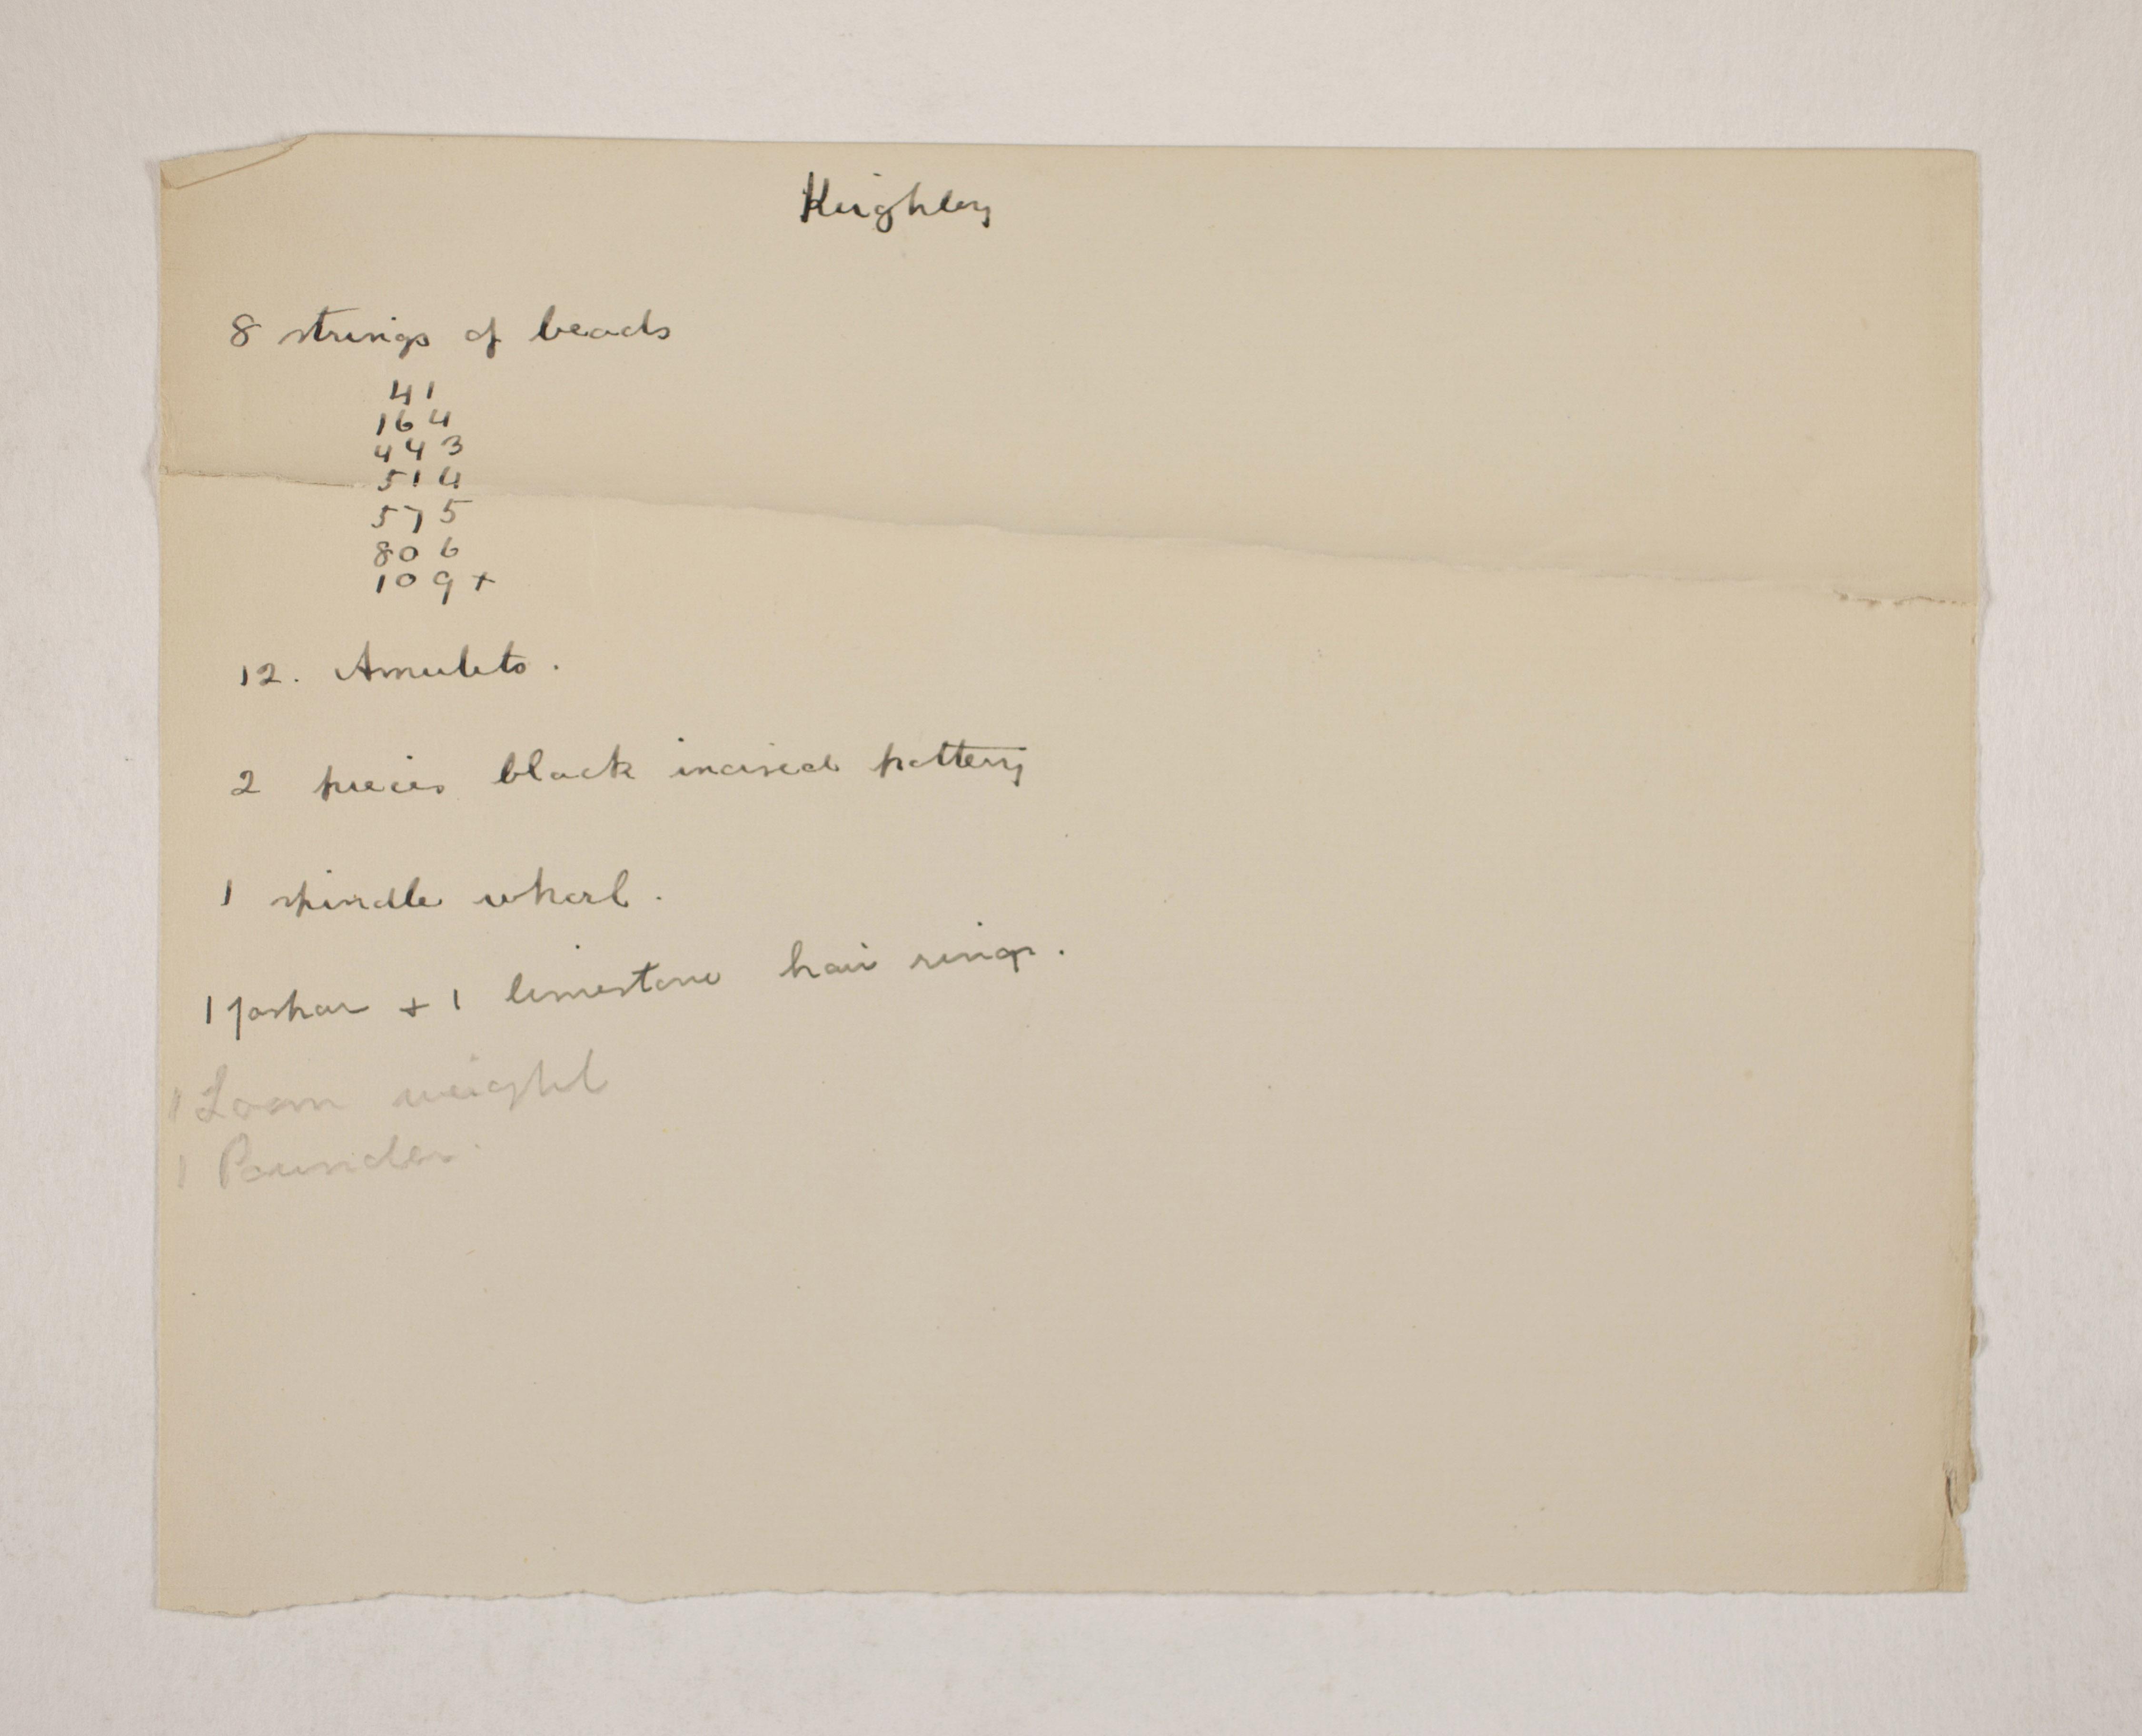 1905-06 Eastern Delta: Belbeis, Tell el-Rataba, Saft el-Hinna, Tell el-Yahudiya, Shaghanbeh, Ghita Individual institution list  PMA/WFP1/D/14/11